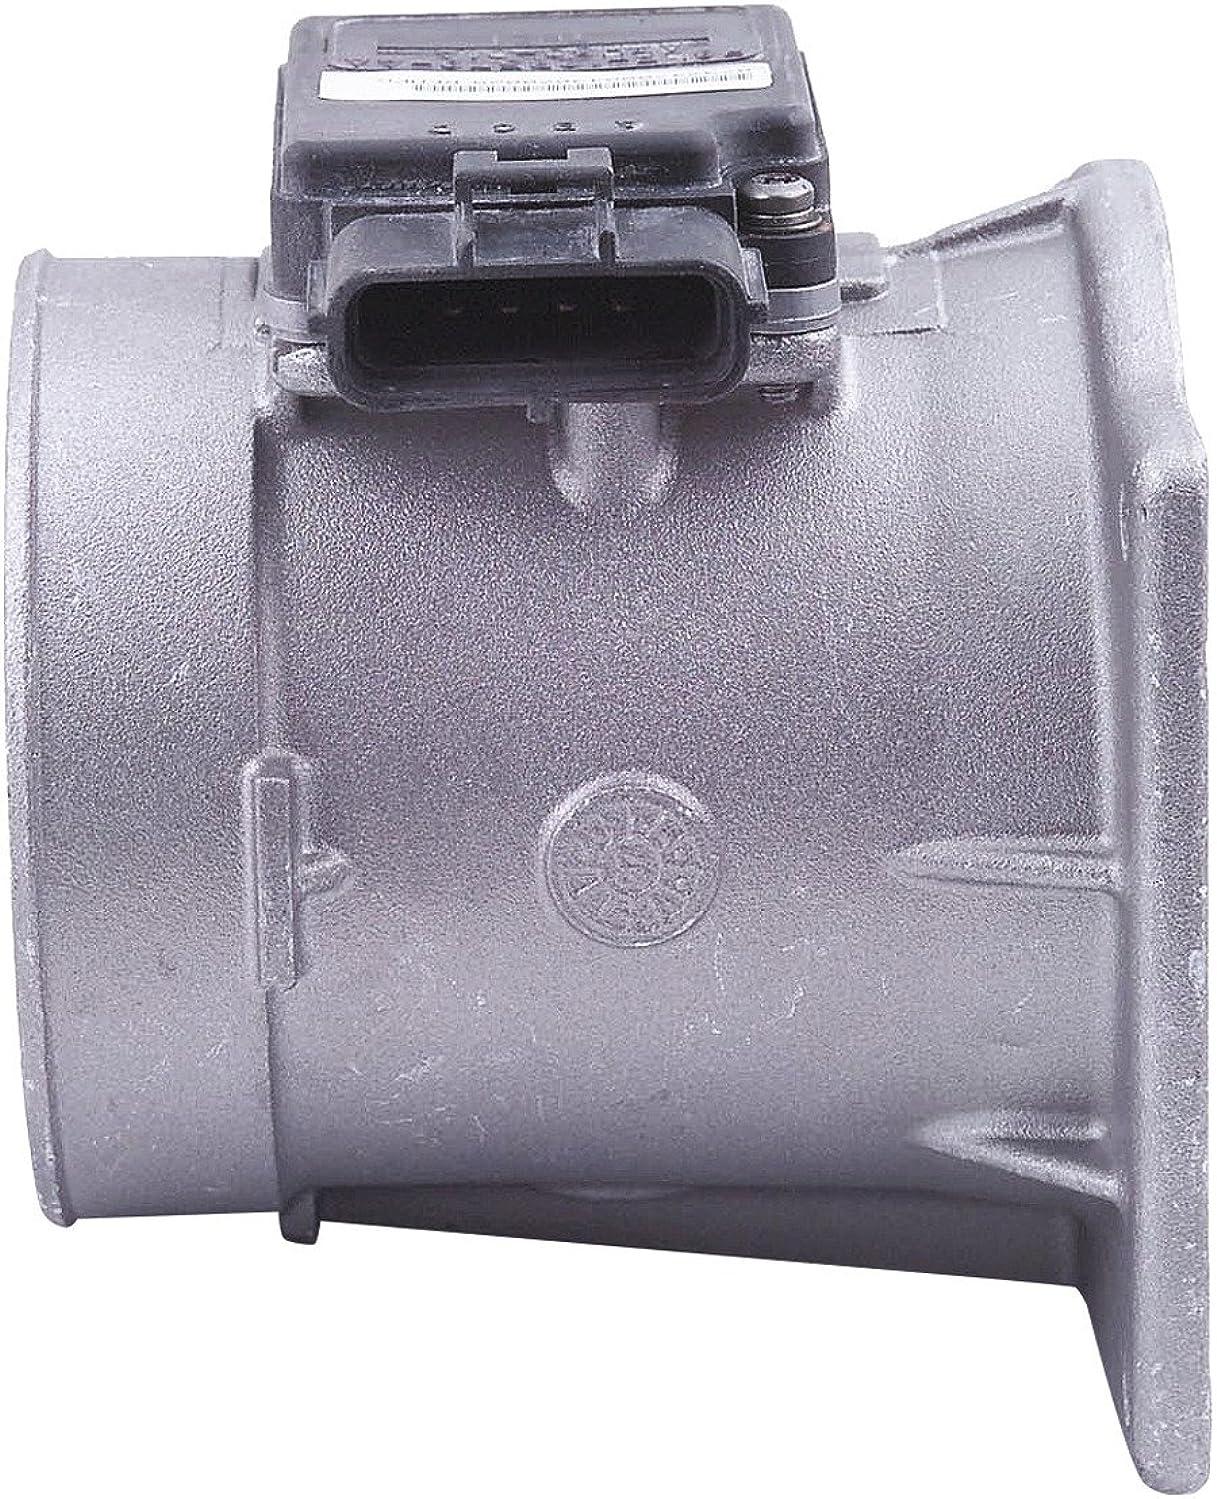 Cardone 74-9524 Remanufactured Mass Airflow Sensor (MAFS)